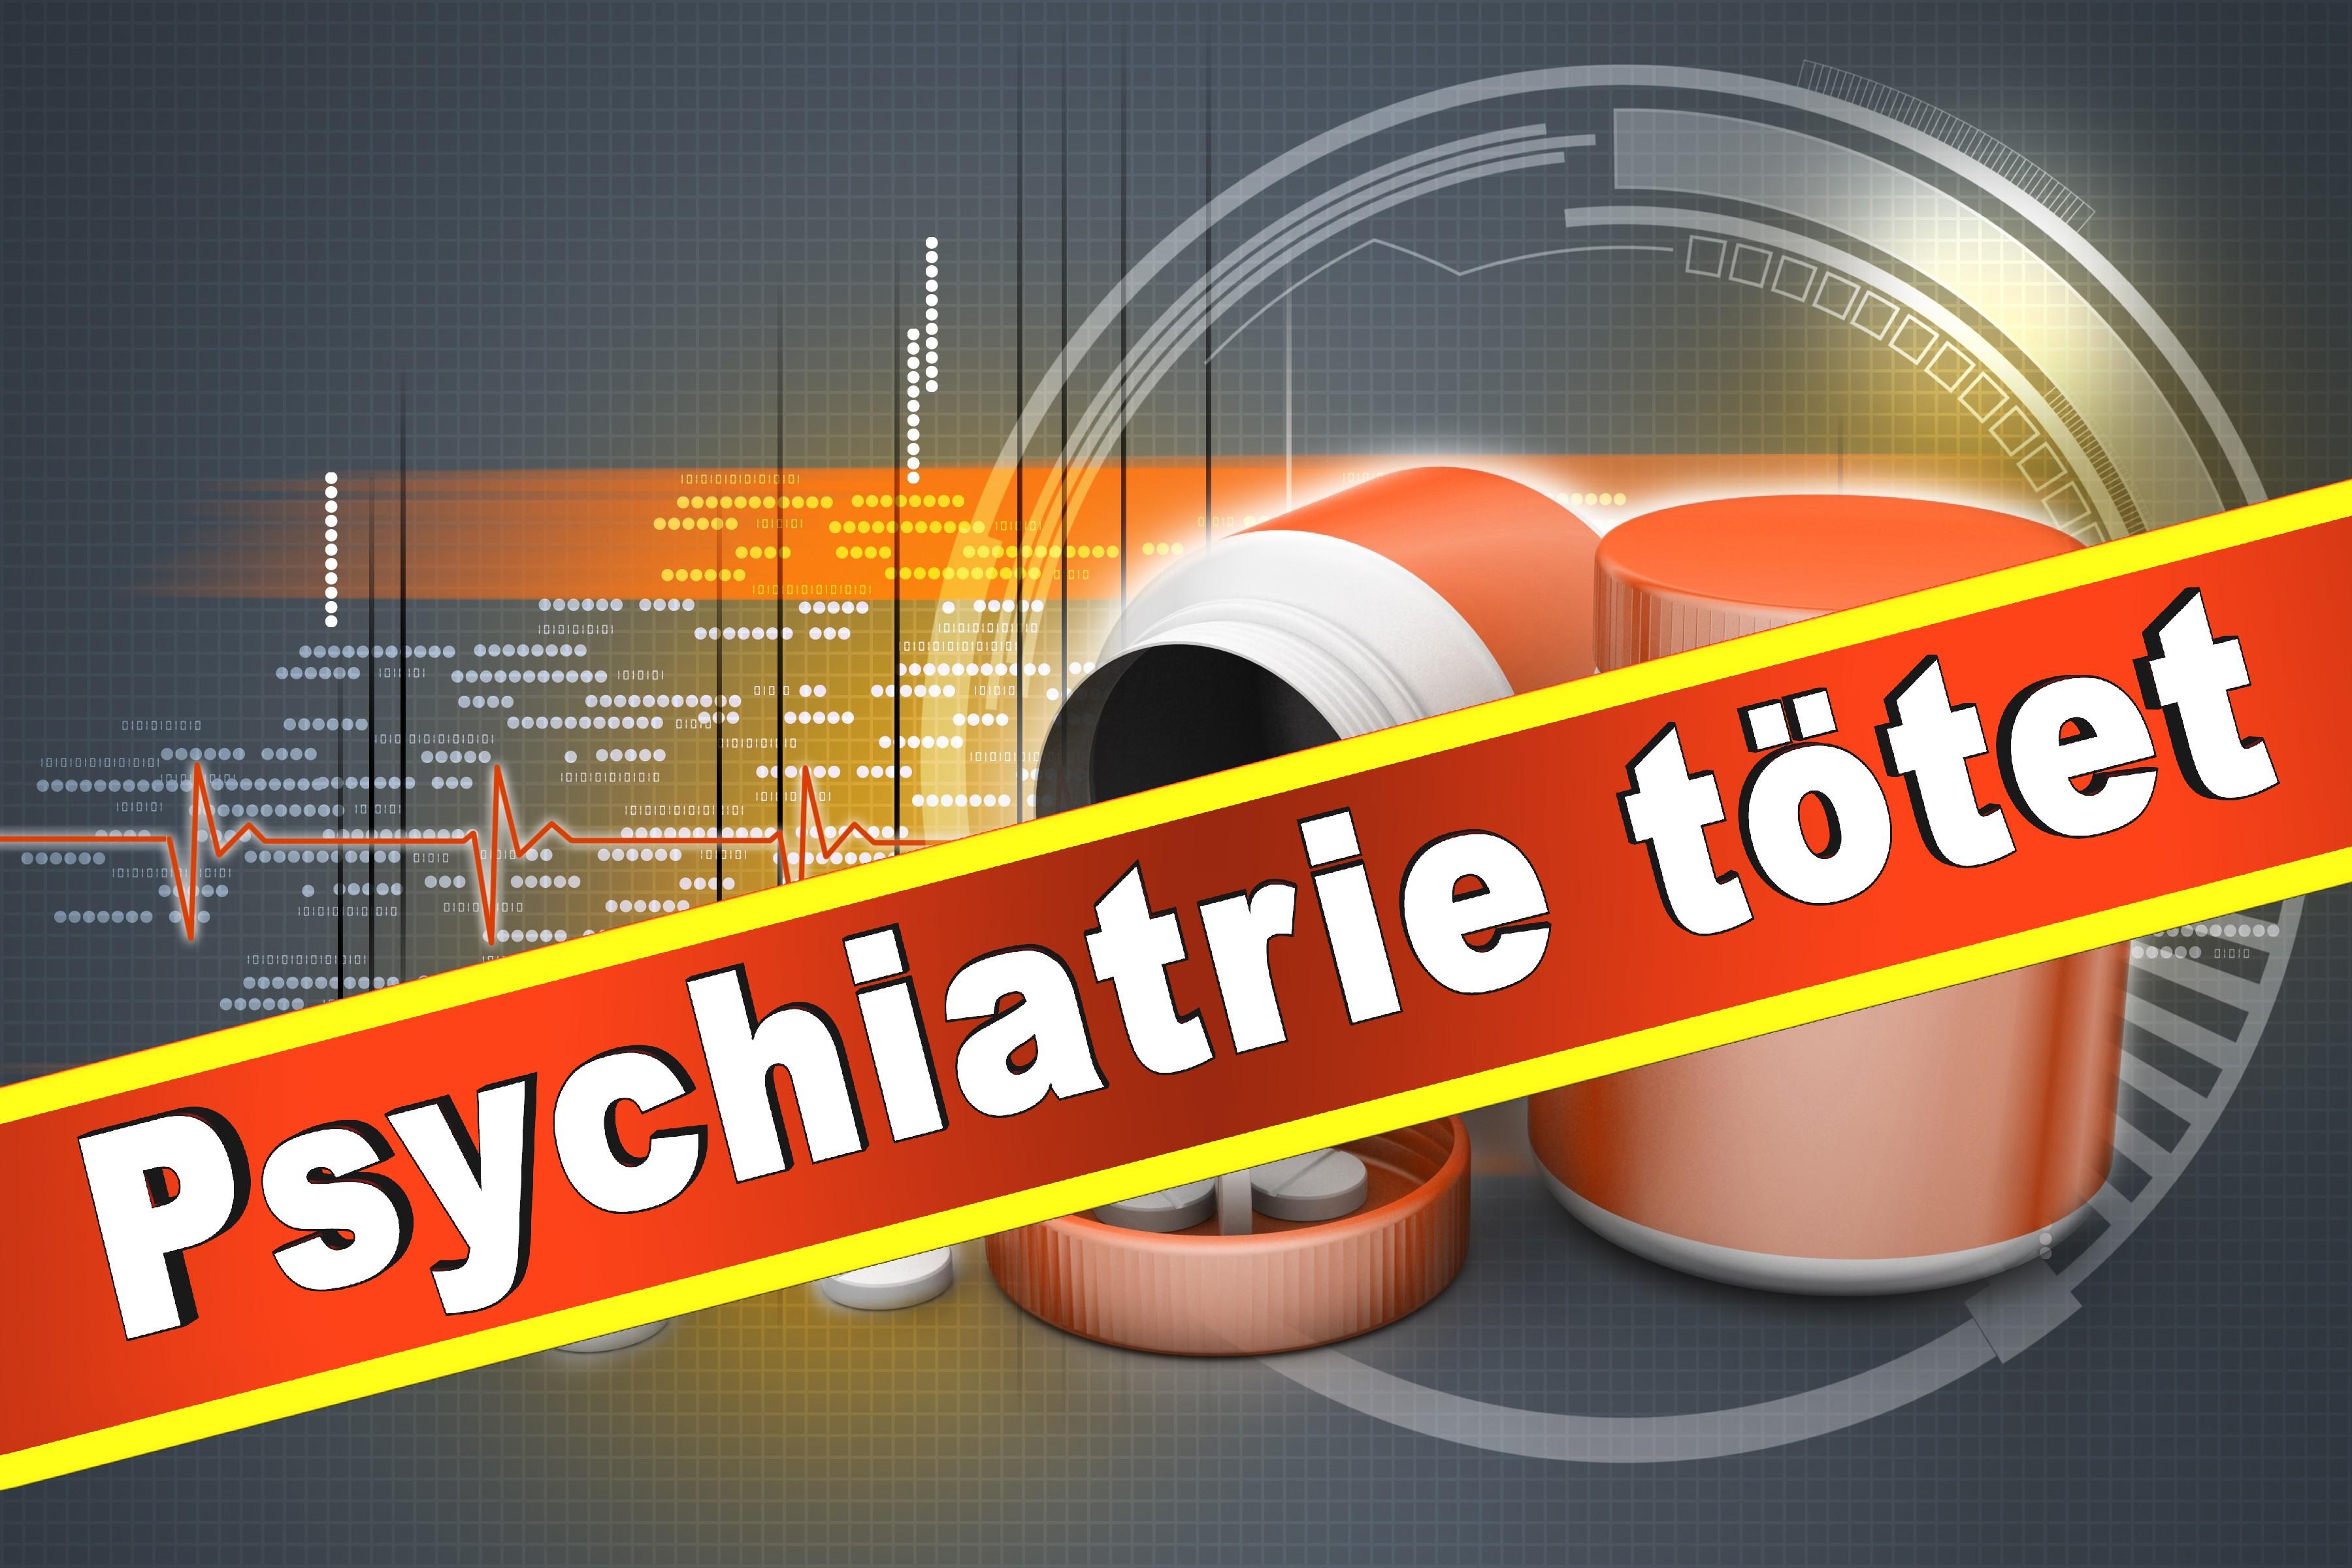 Herr Karl Heinz Schiller Psychotherapeut Laatzen Gutachten Psychiater Facharzt Psychiatrie